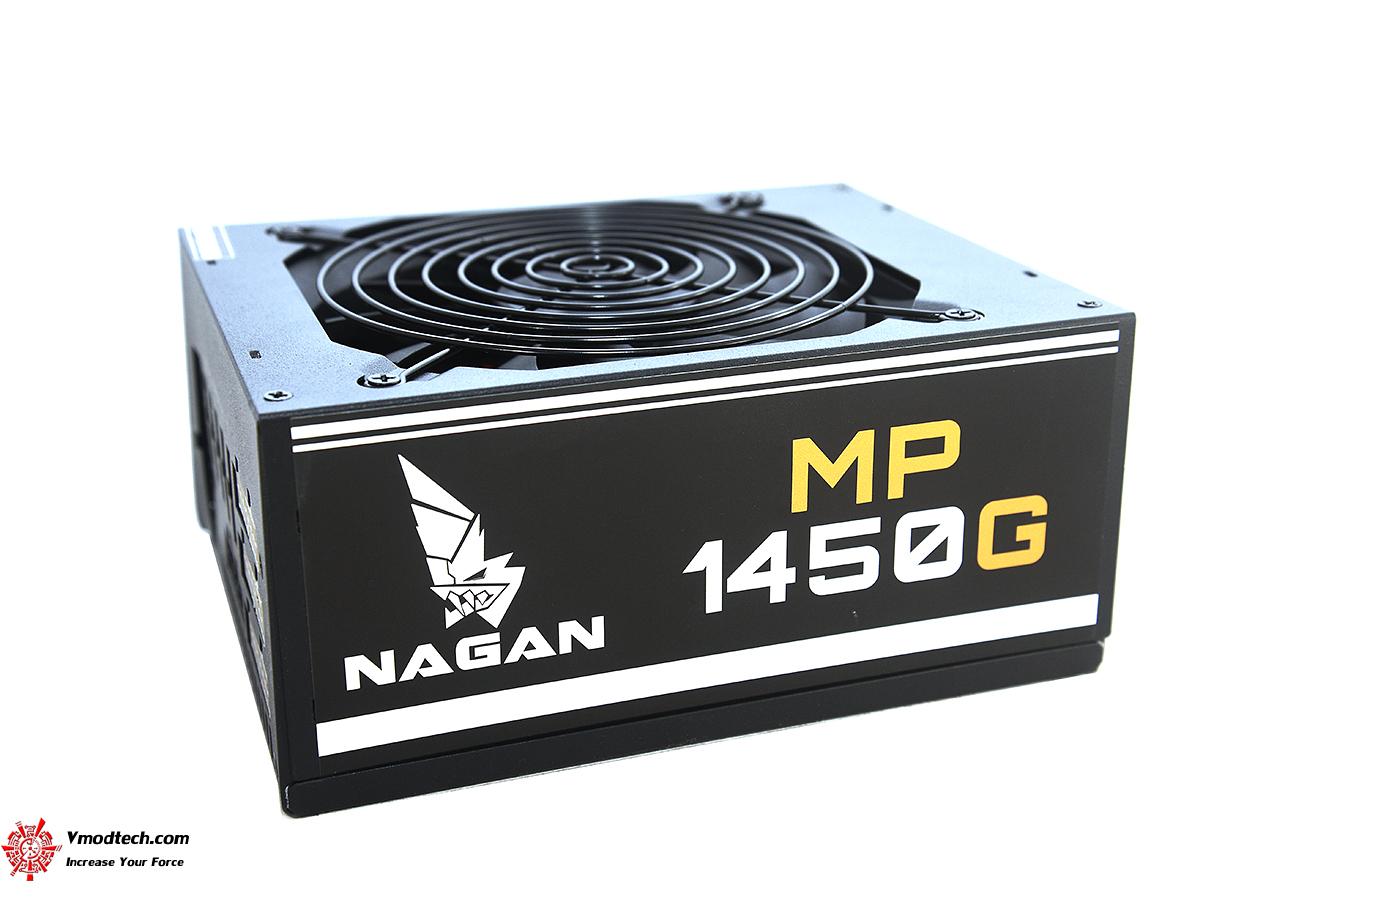 dsc 7264 NAGAN MP 1450G MINING POWER SUPPLY REVIEW